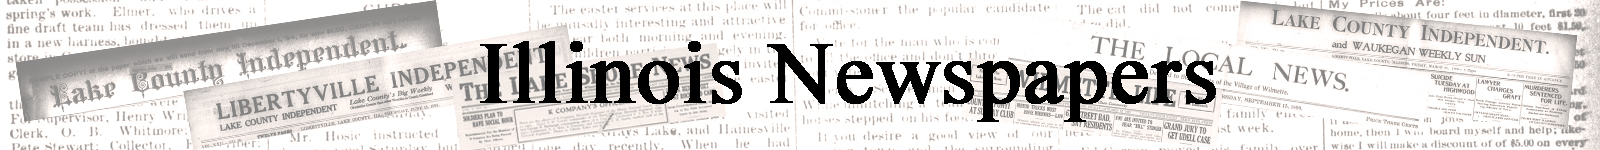 Illinois News Index